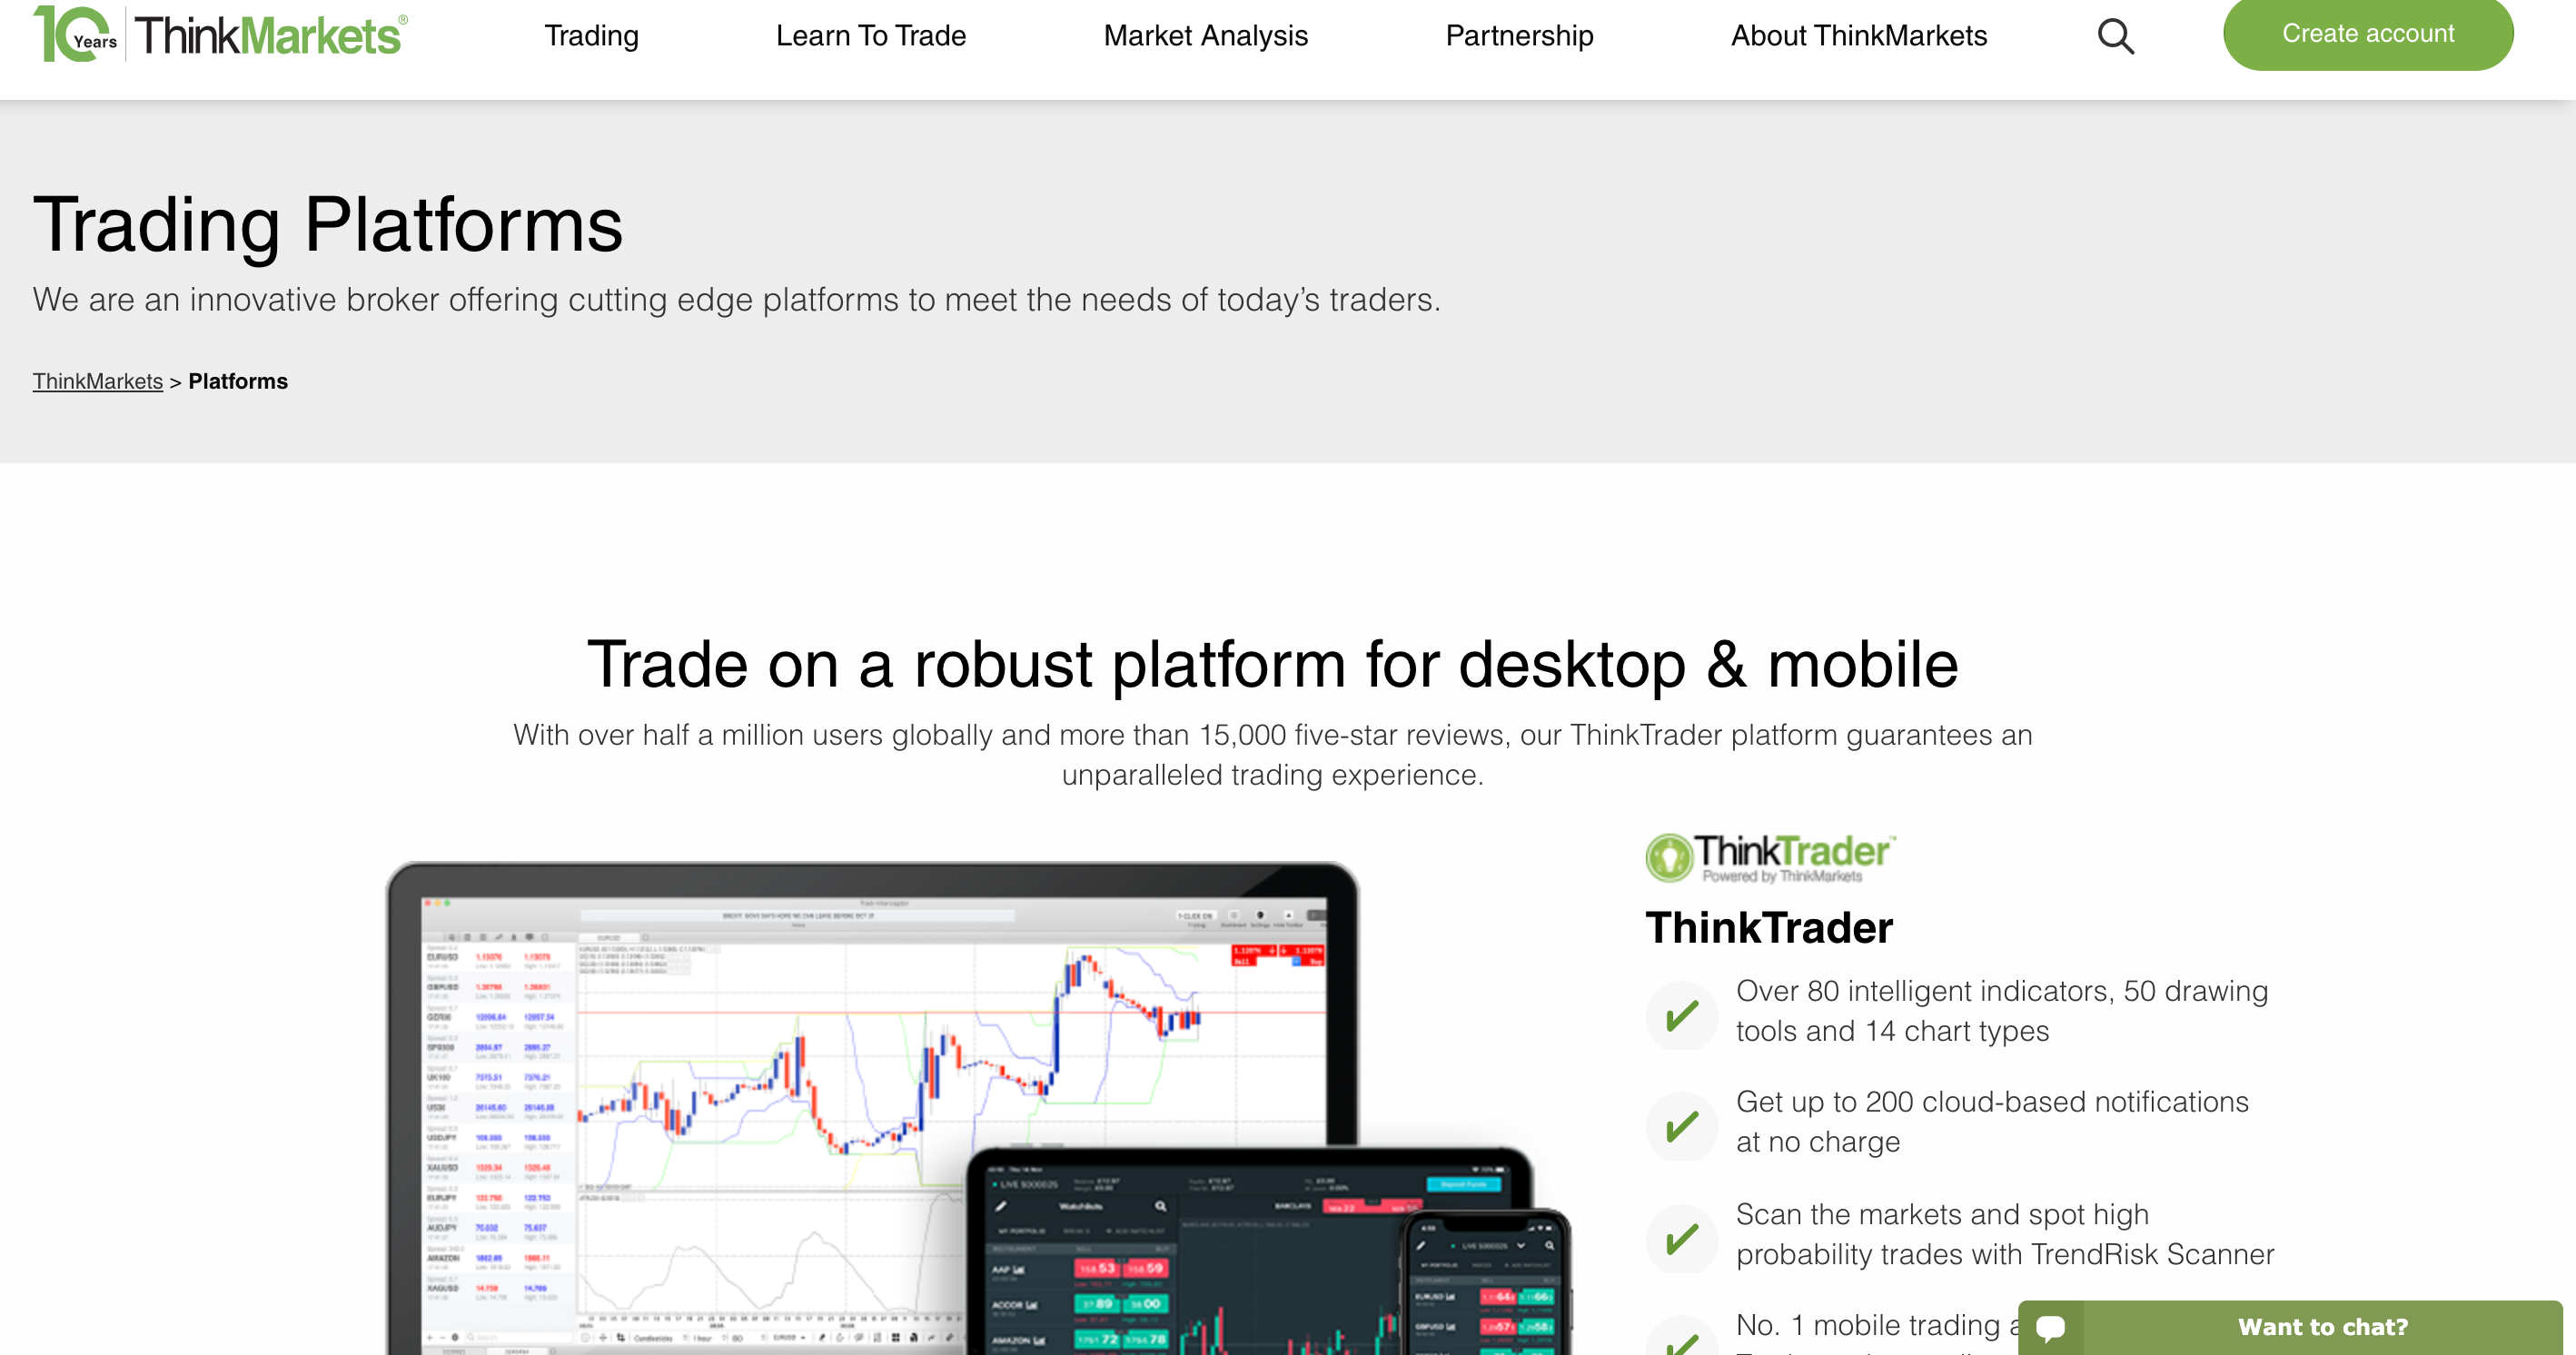 ThinkMarkets trading platforms